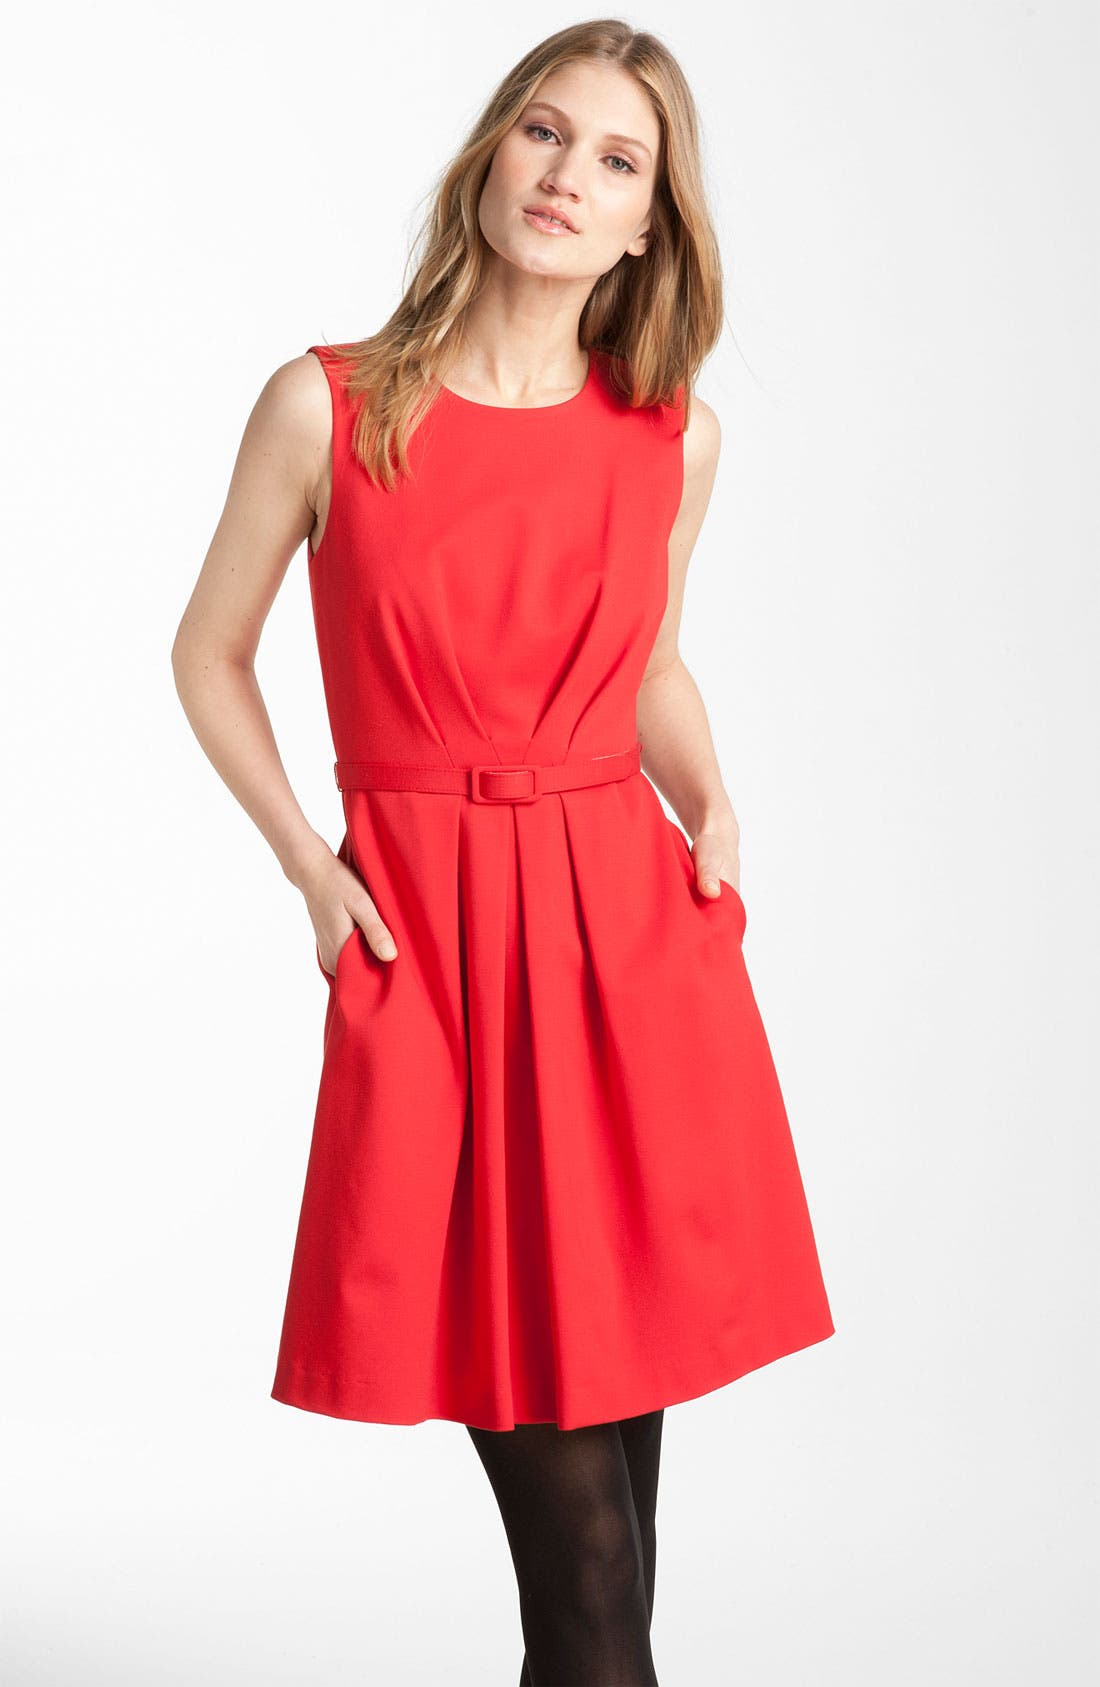 Alternate Image 1 Selected - Trina Turk 'Princess' Ponte Knit Dress